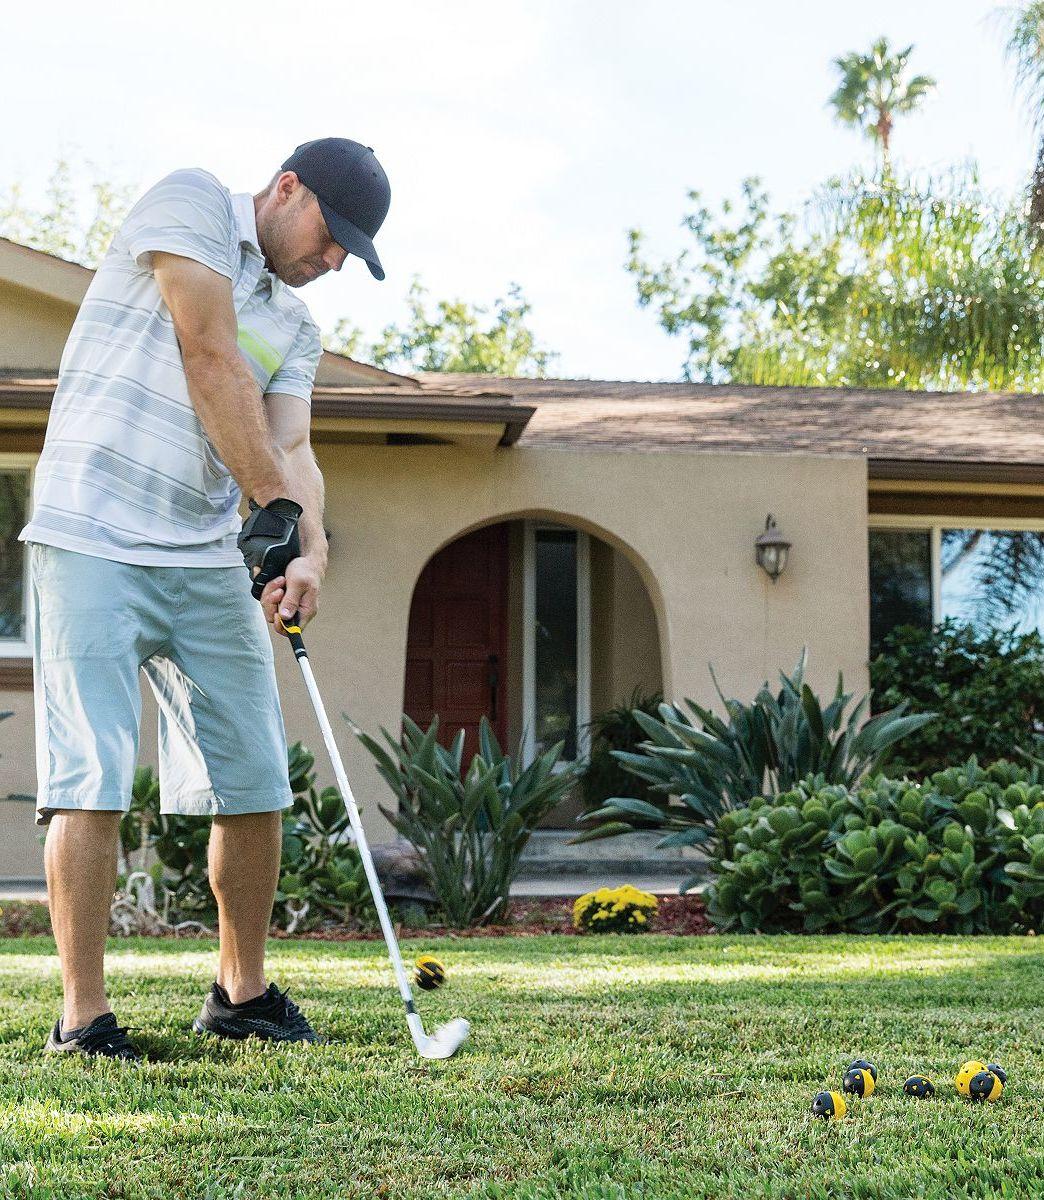 SKLZ Impact Training Golf Balls